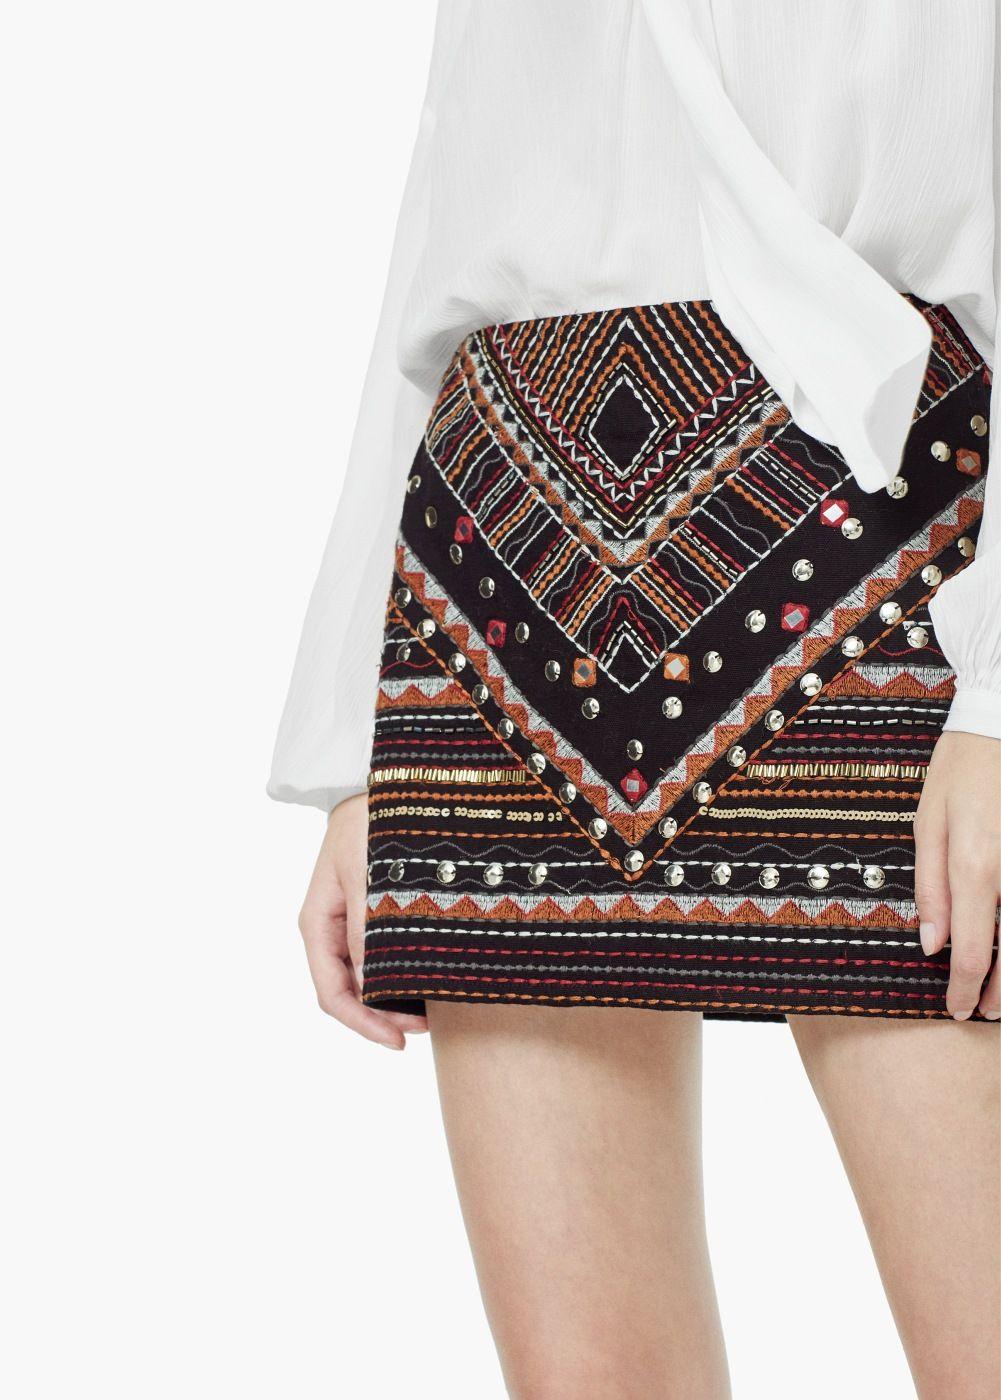 46248f099 Falda bordado abalorios - Mujer